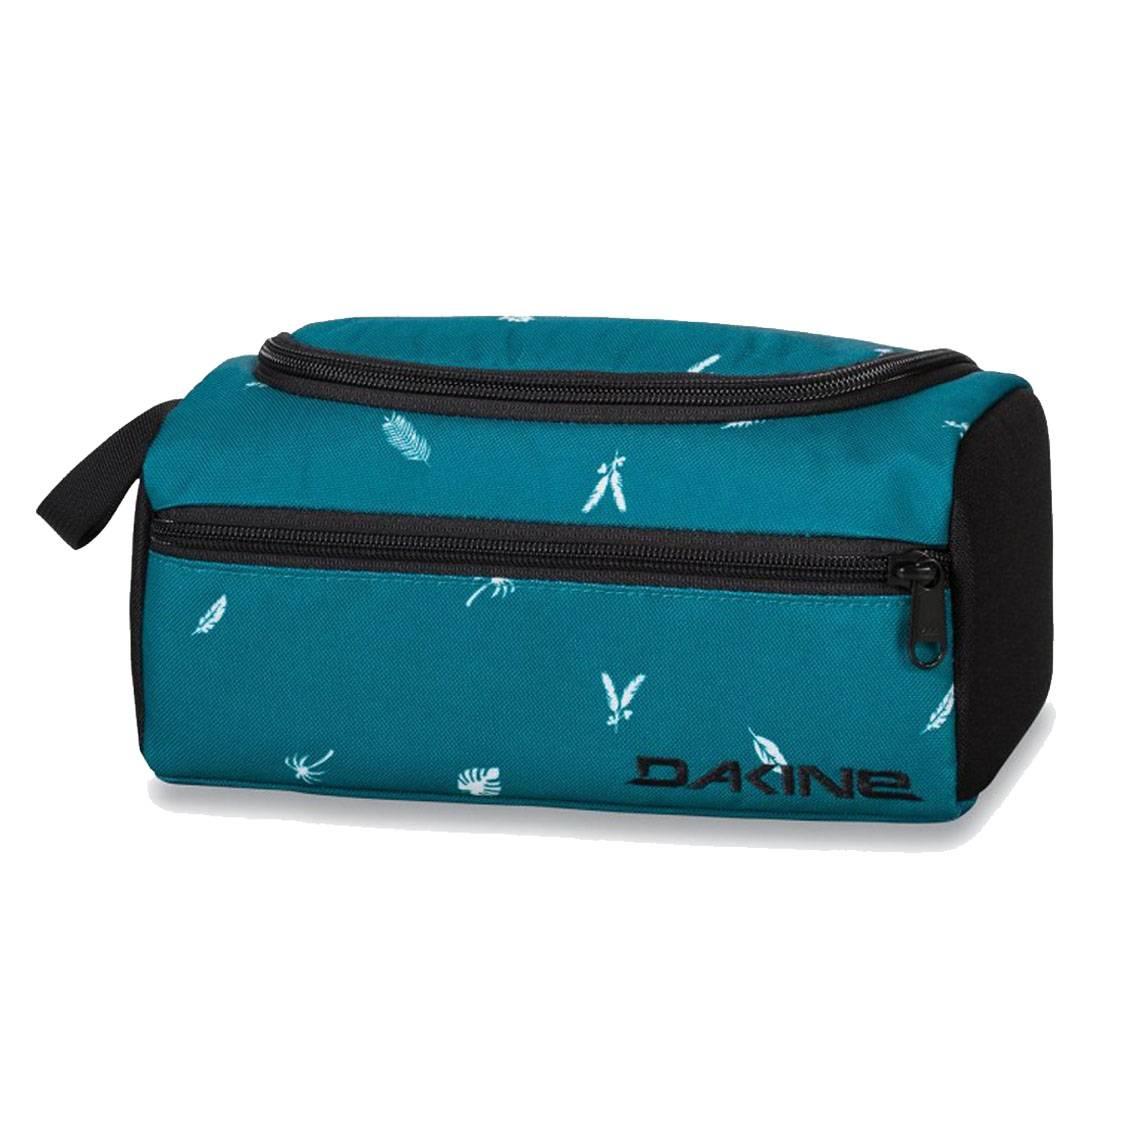 trousse de toilette dakine groomer bleu canard imprim s feuilles rue des hommes. Black Bedroom Furniture Sets. Home Design Ideas